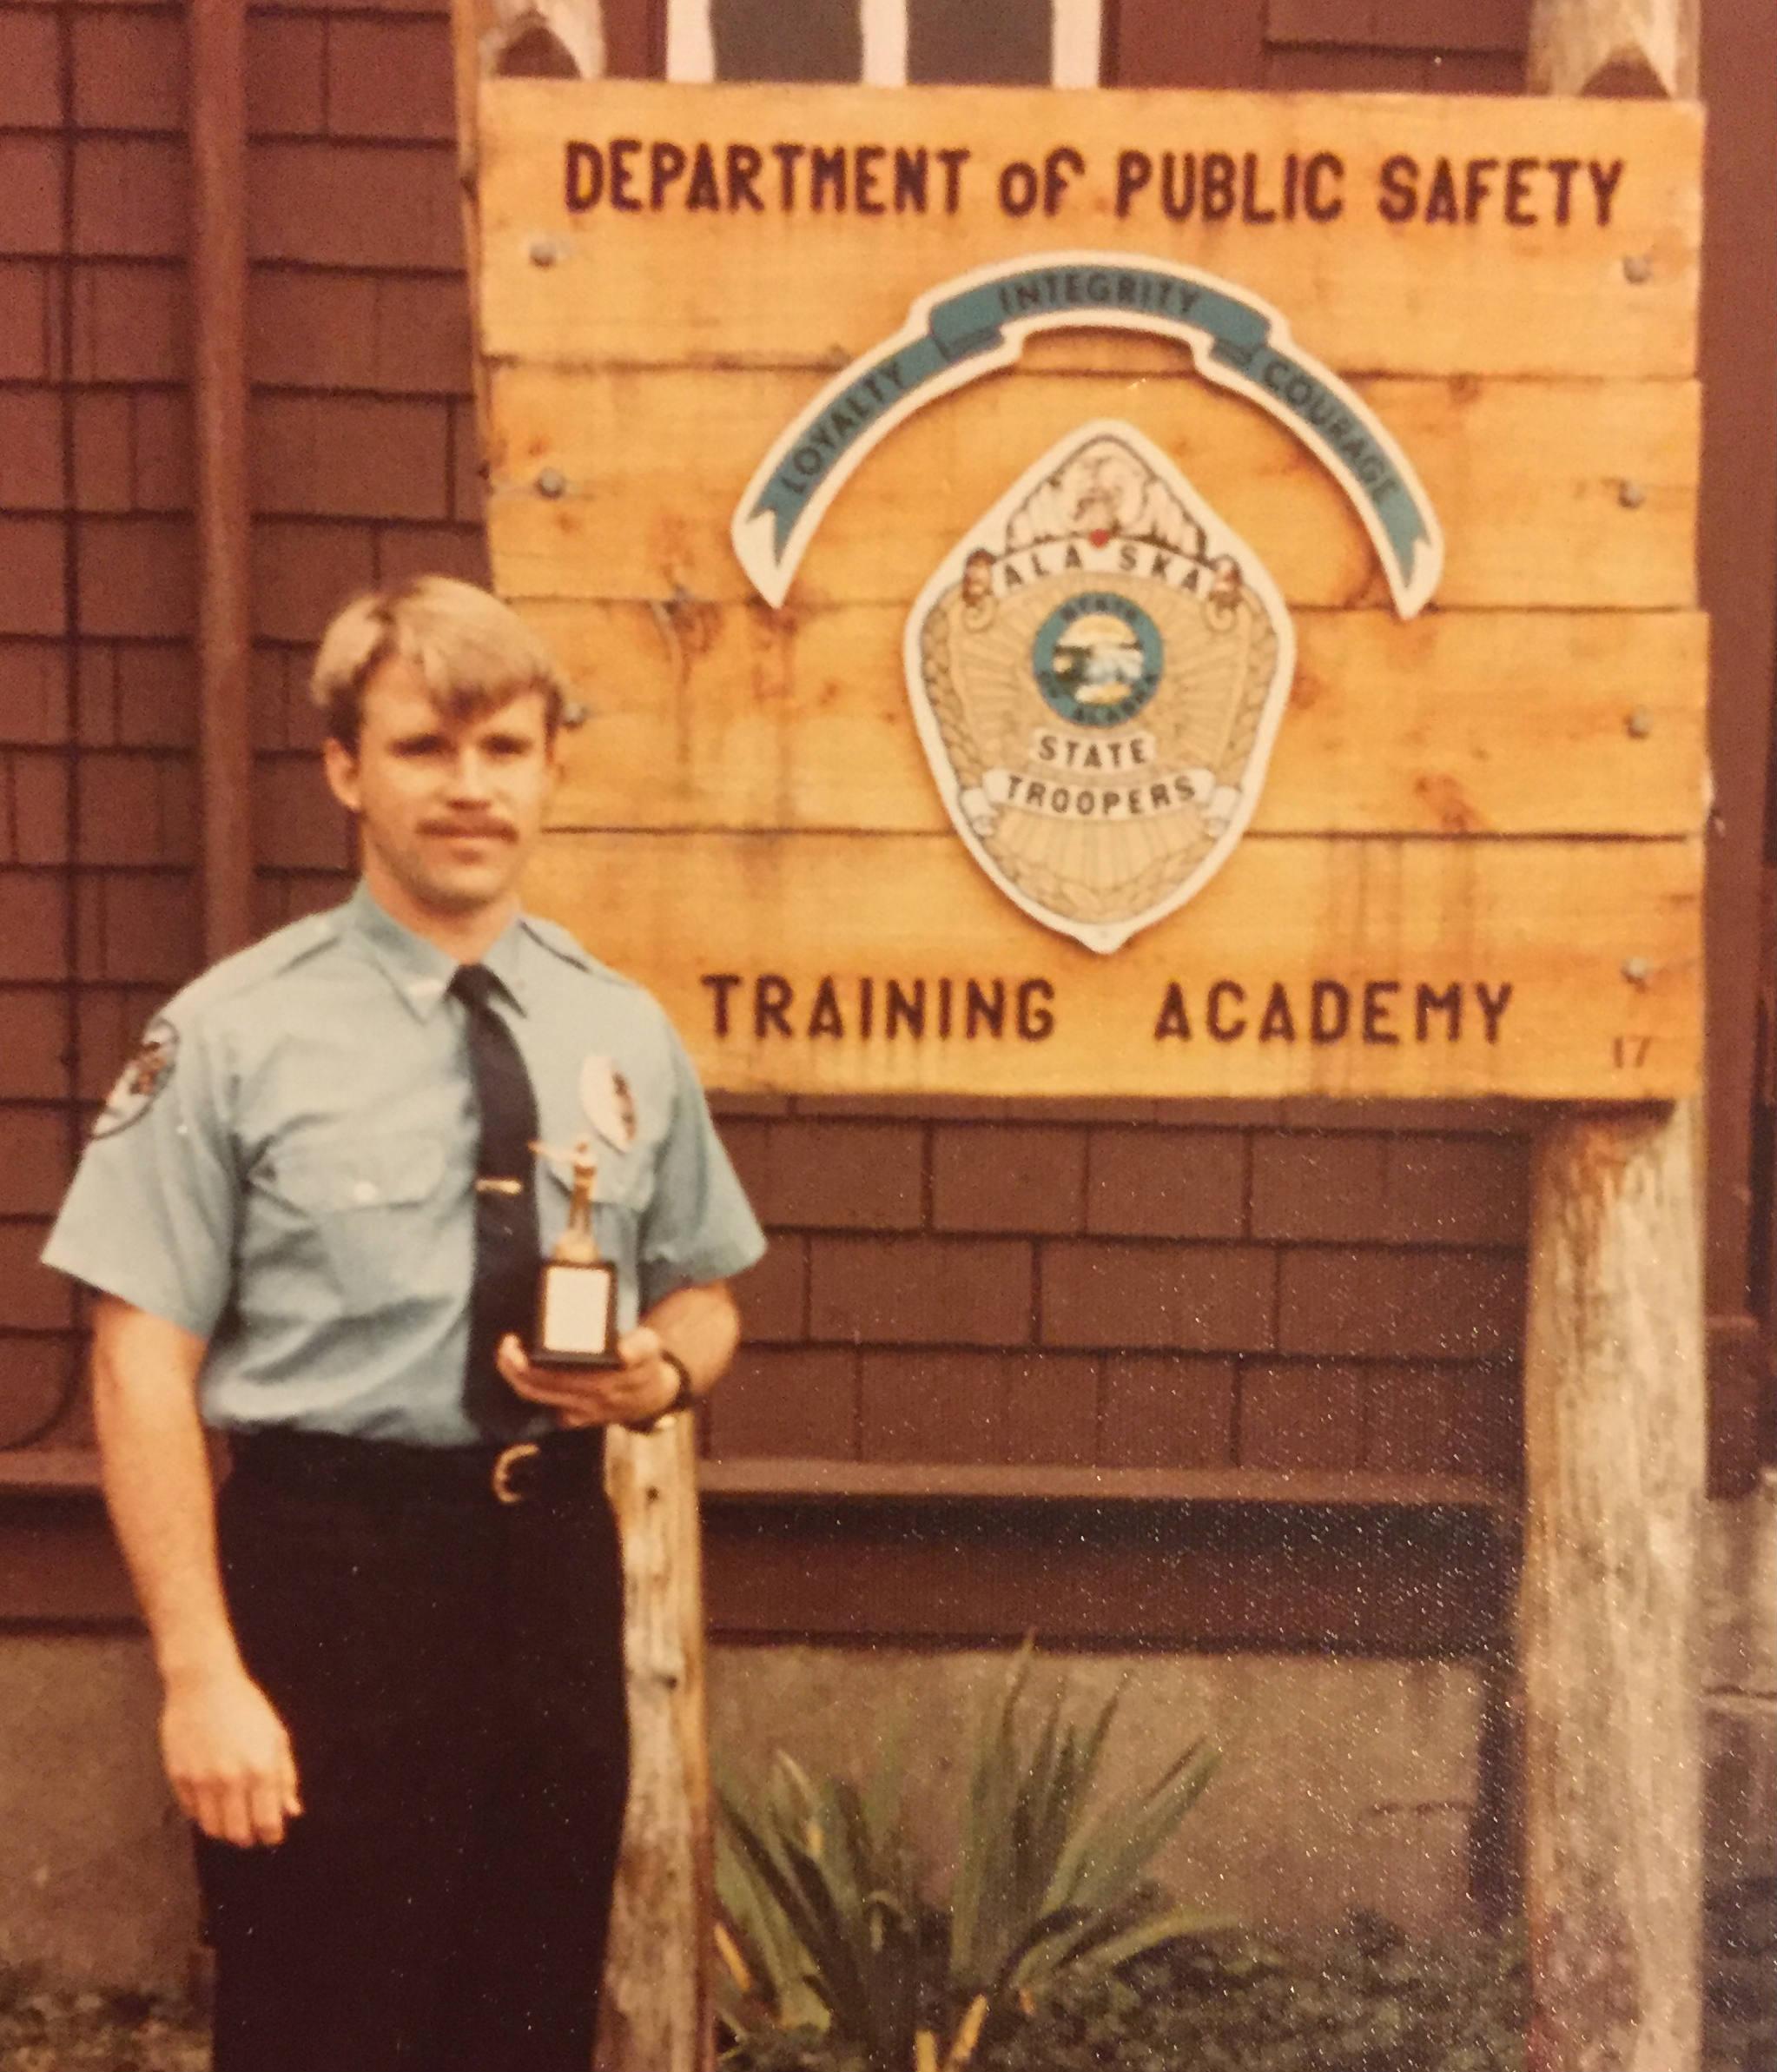 Police training academy, Sitka